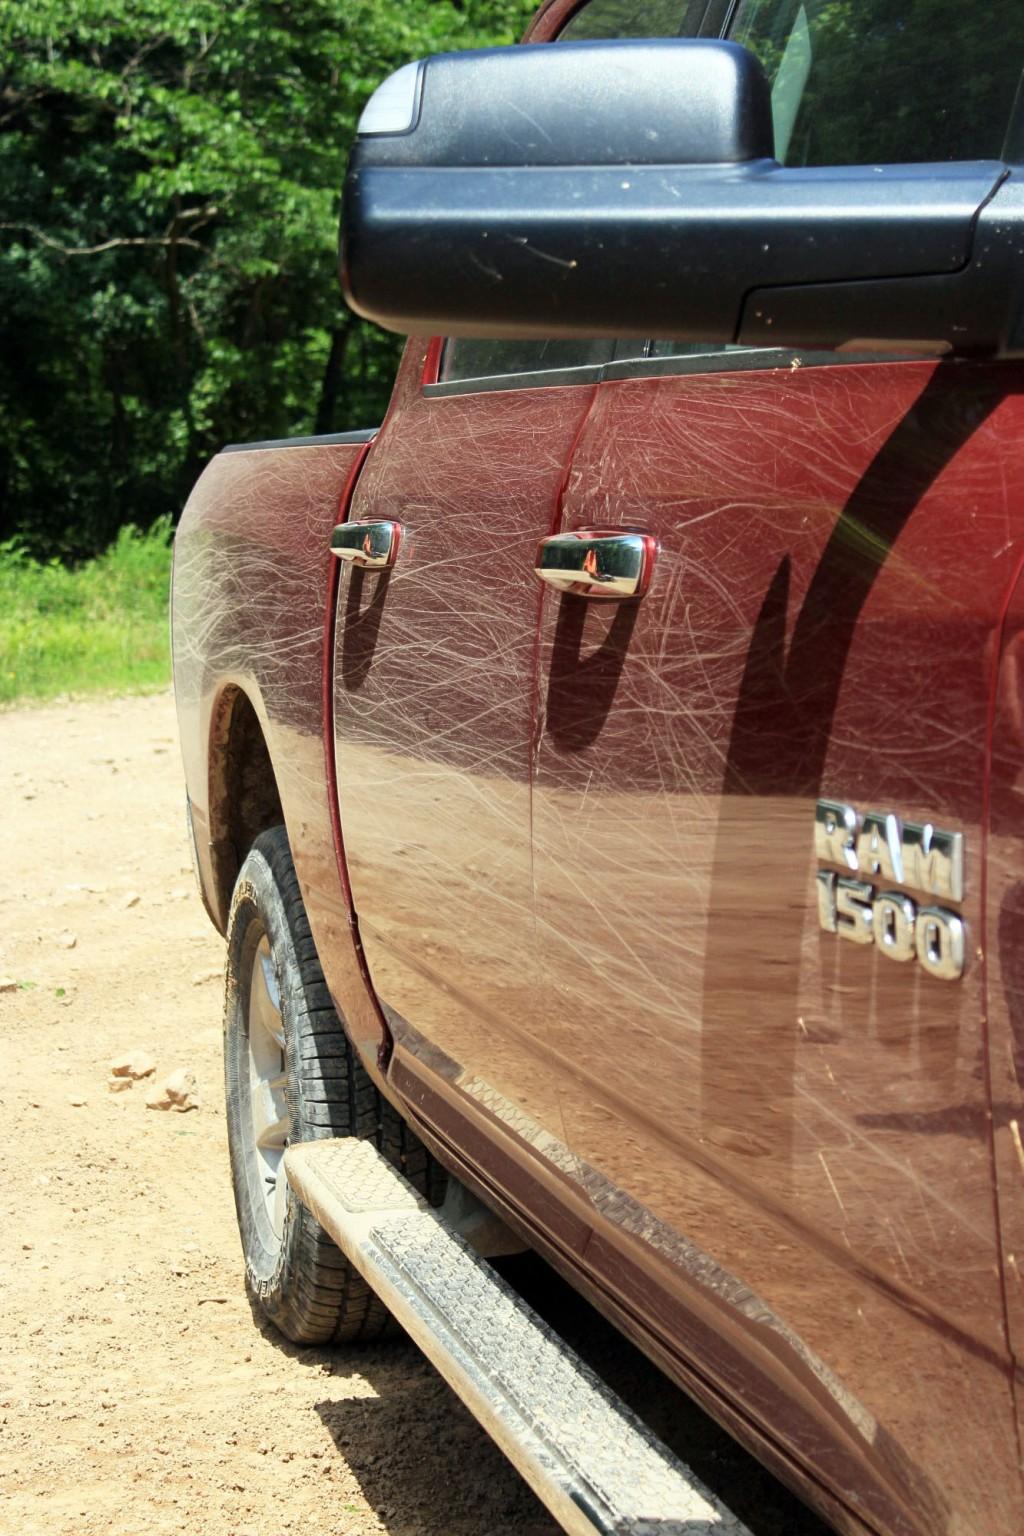 2013 Ram 1500 Off Road: 30 Days Of Ram